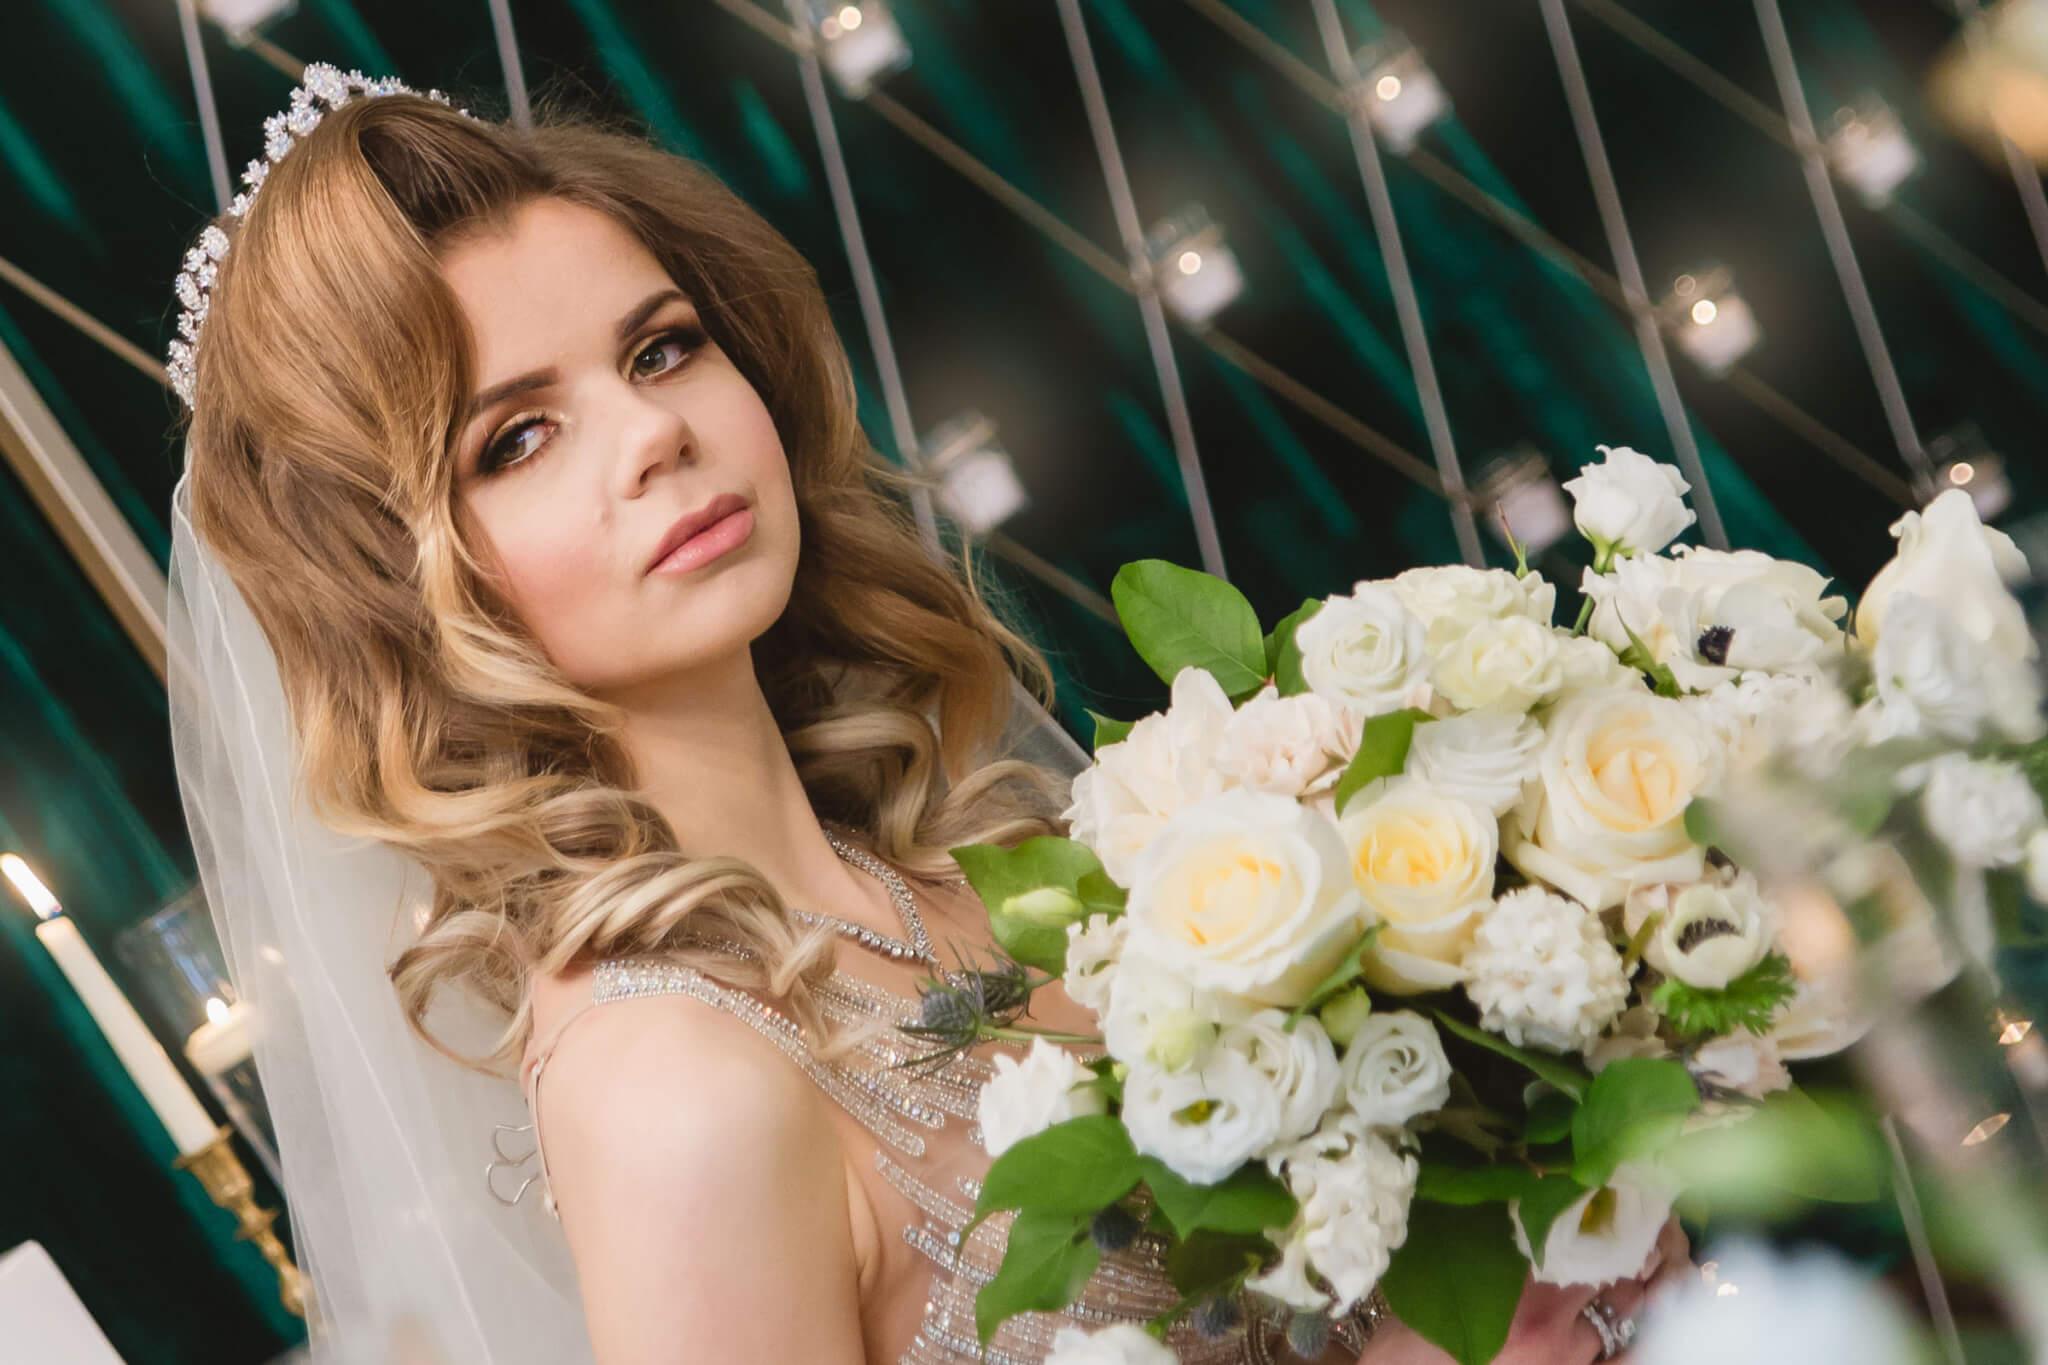 Ottawa Bride and Wedding Photography at Sala San Marco